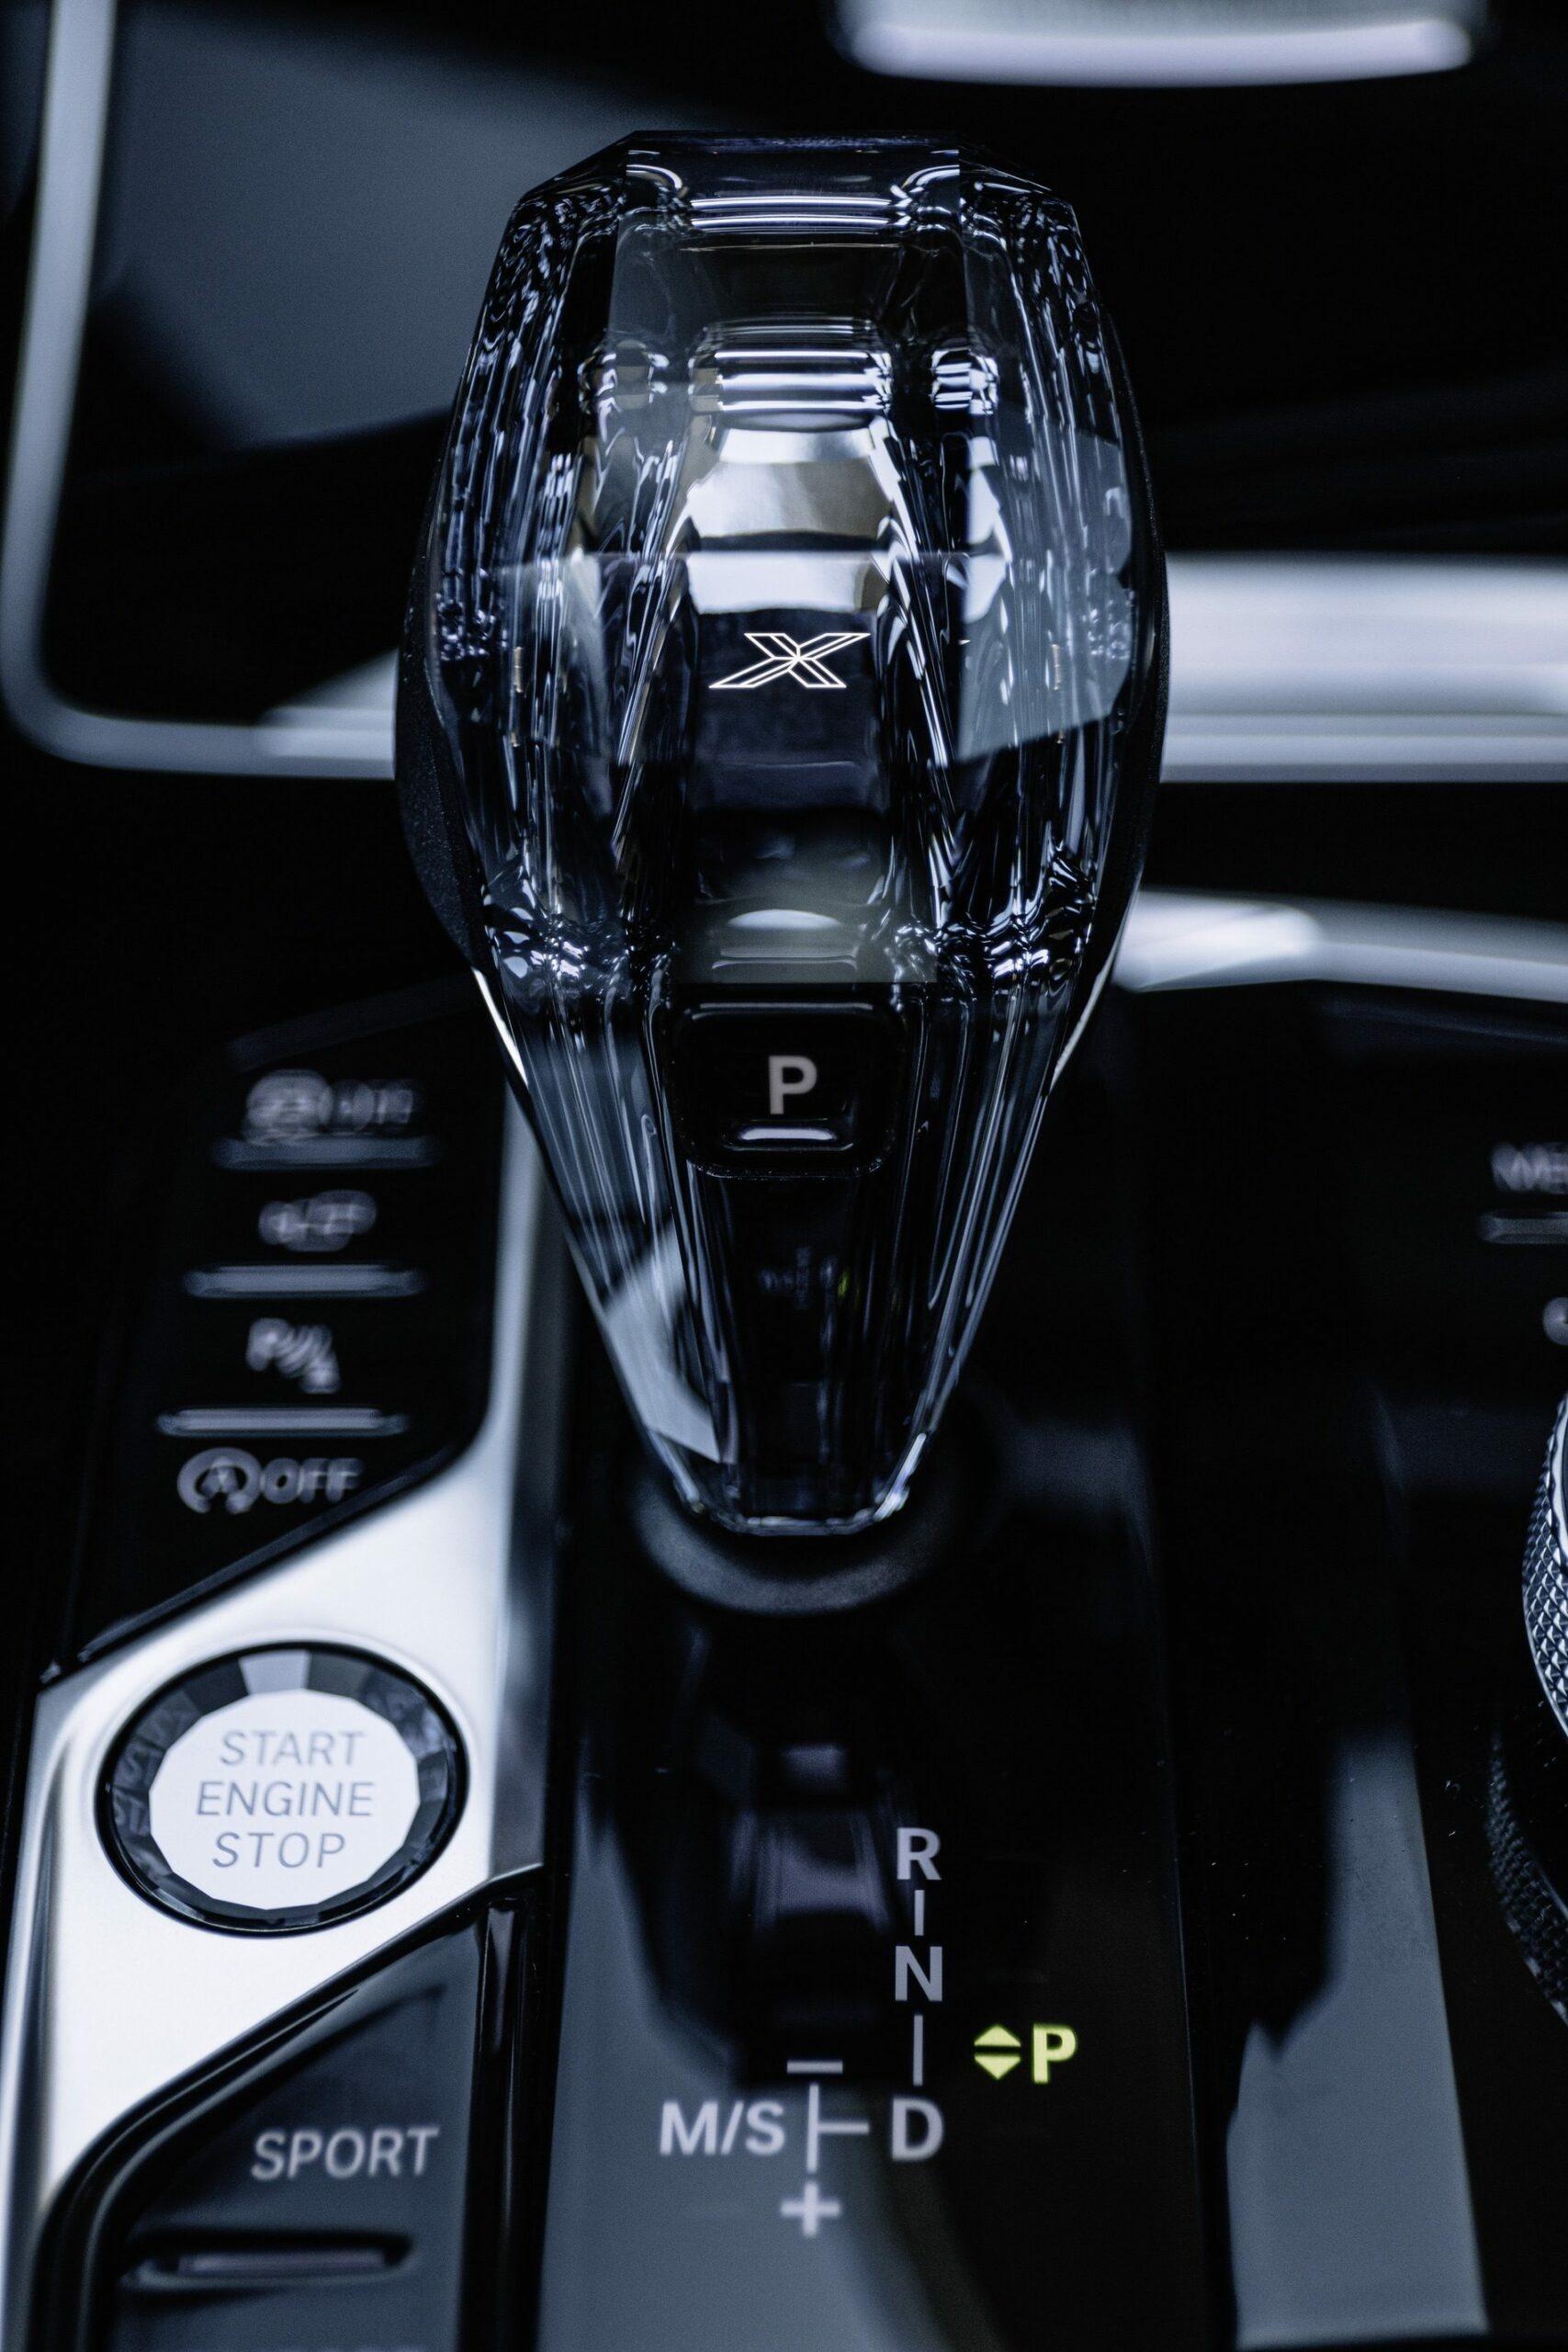 Phien ban BMW X7 hieu nang cao anh 25